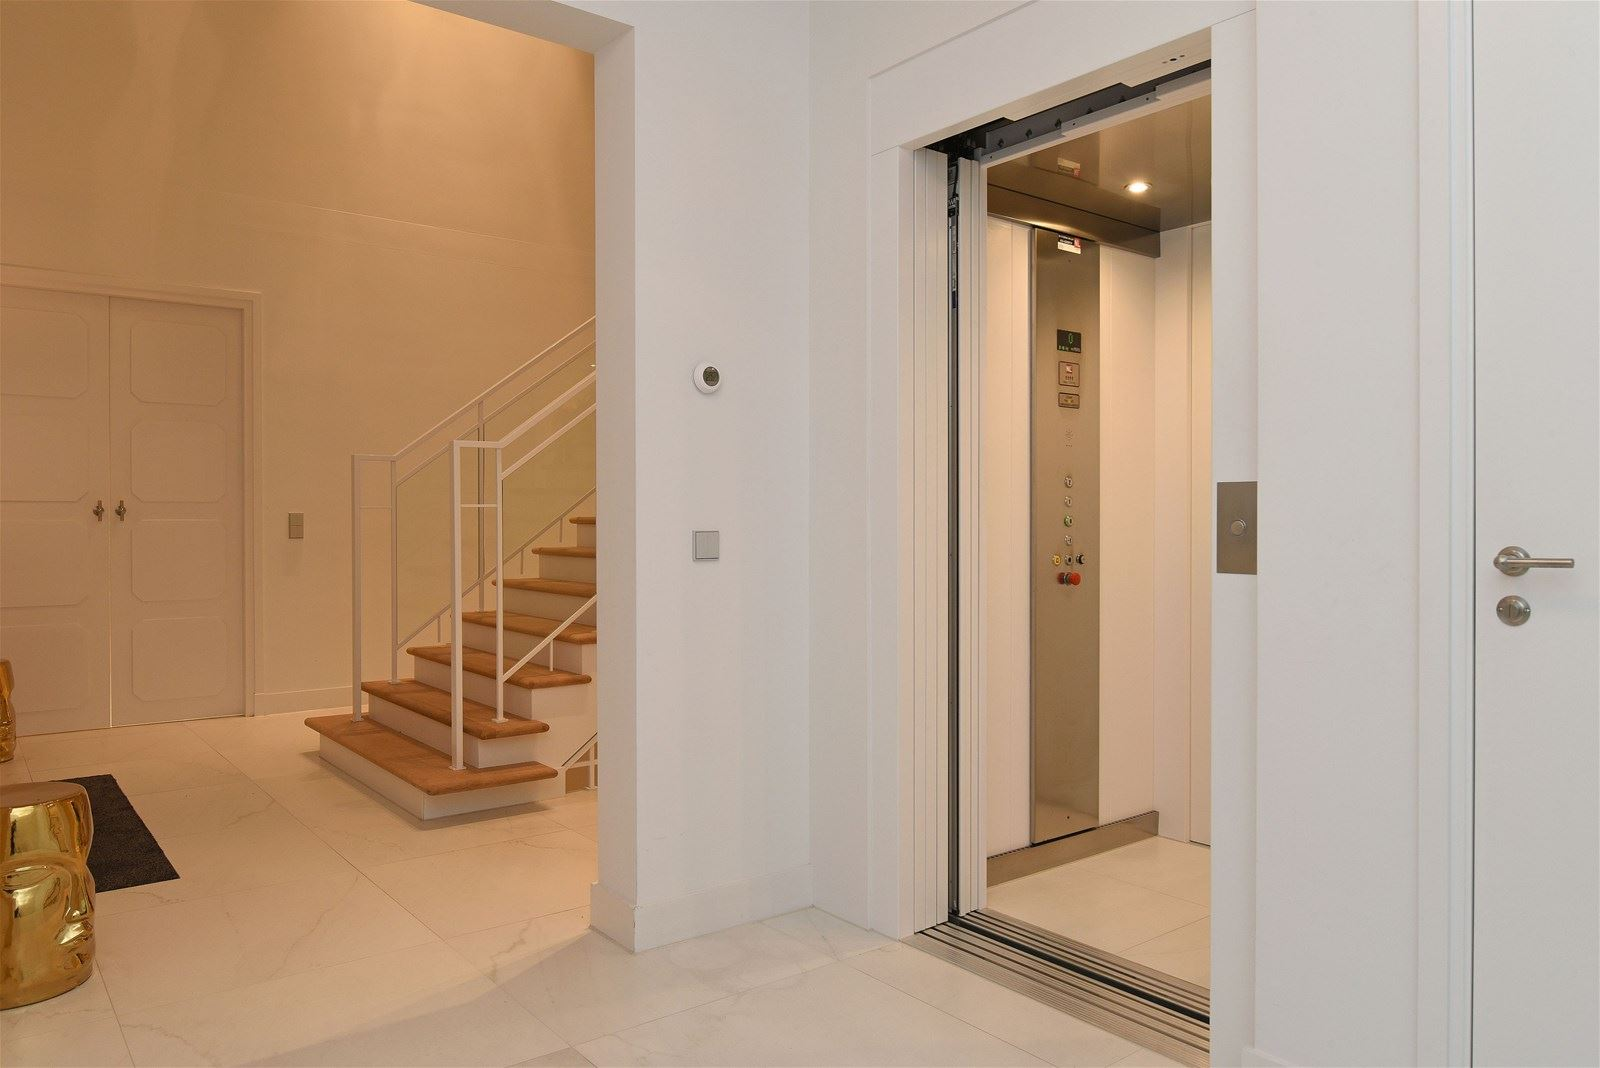 Huis te koop: legrasweg 9 1251 gs laren nh [funda]